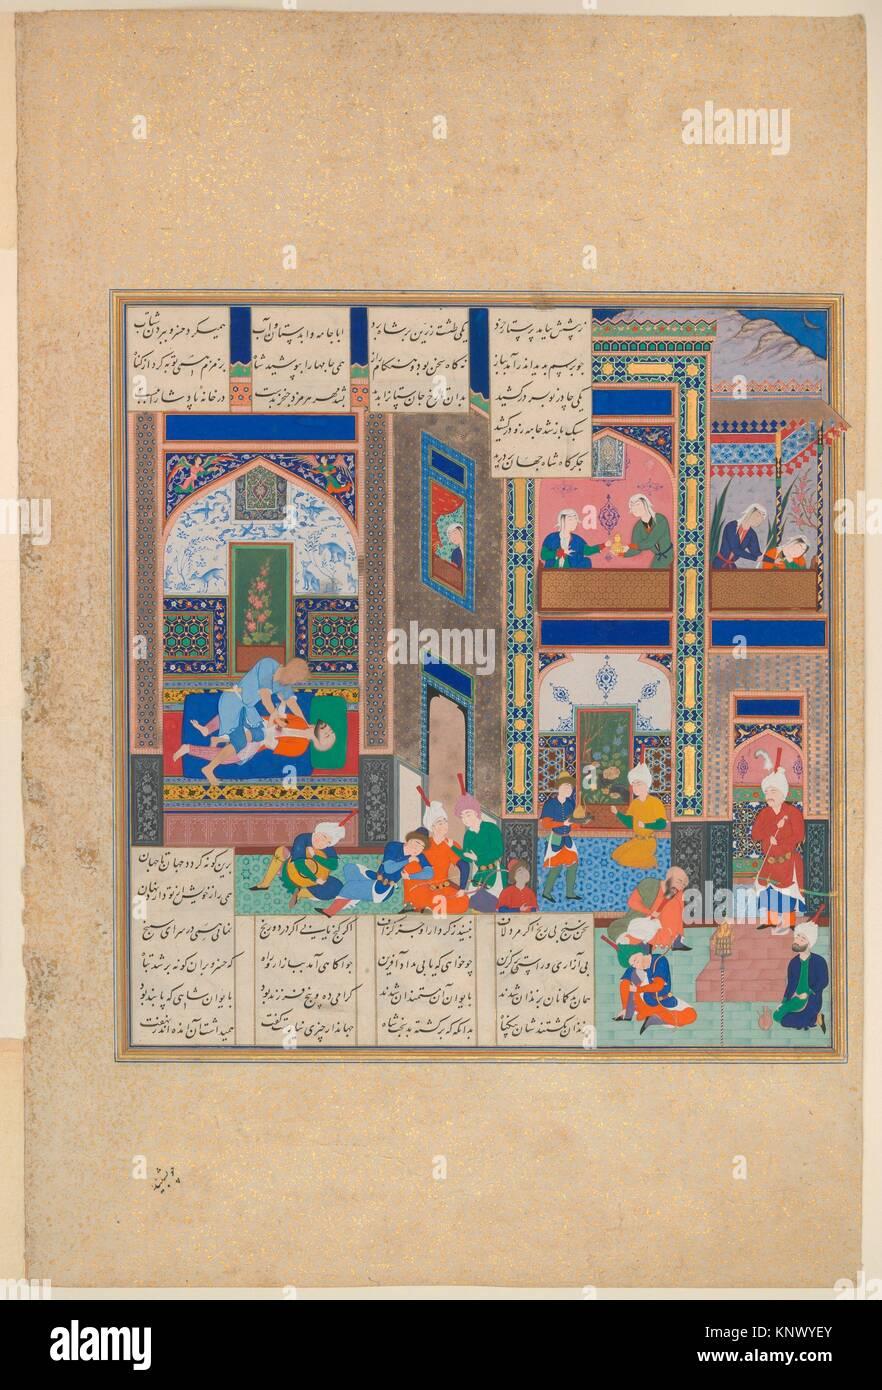 The Assassination of Khusrau Parviz, Folio 742v from the Shahnama (Book of Kings) of Shah Tahmasp. Author: Abu'l - Stock Image